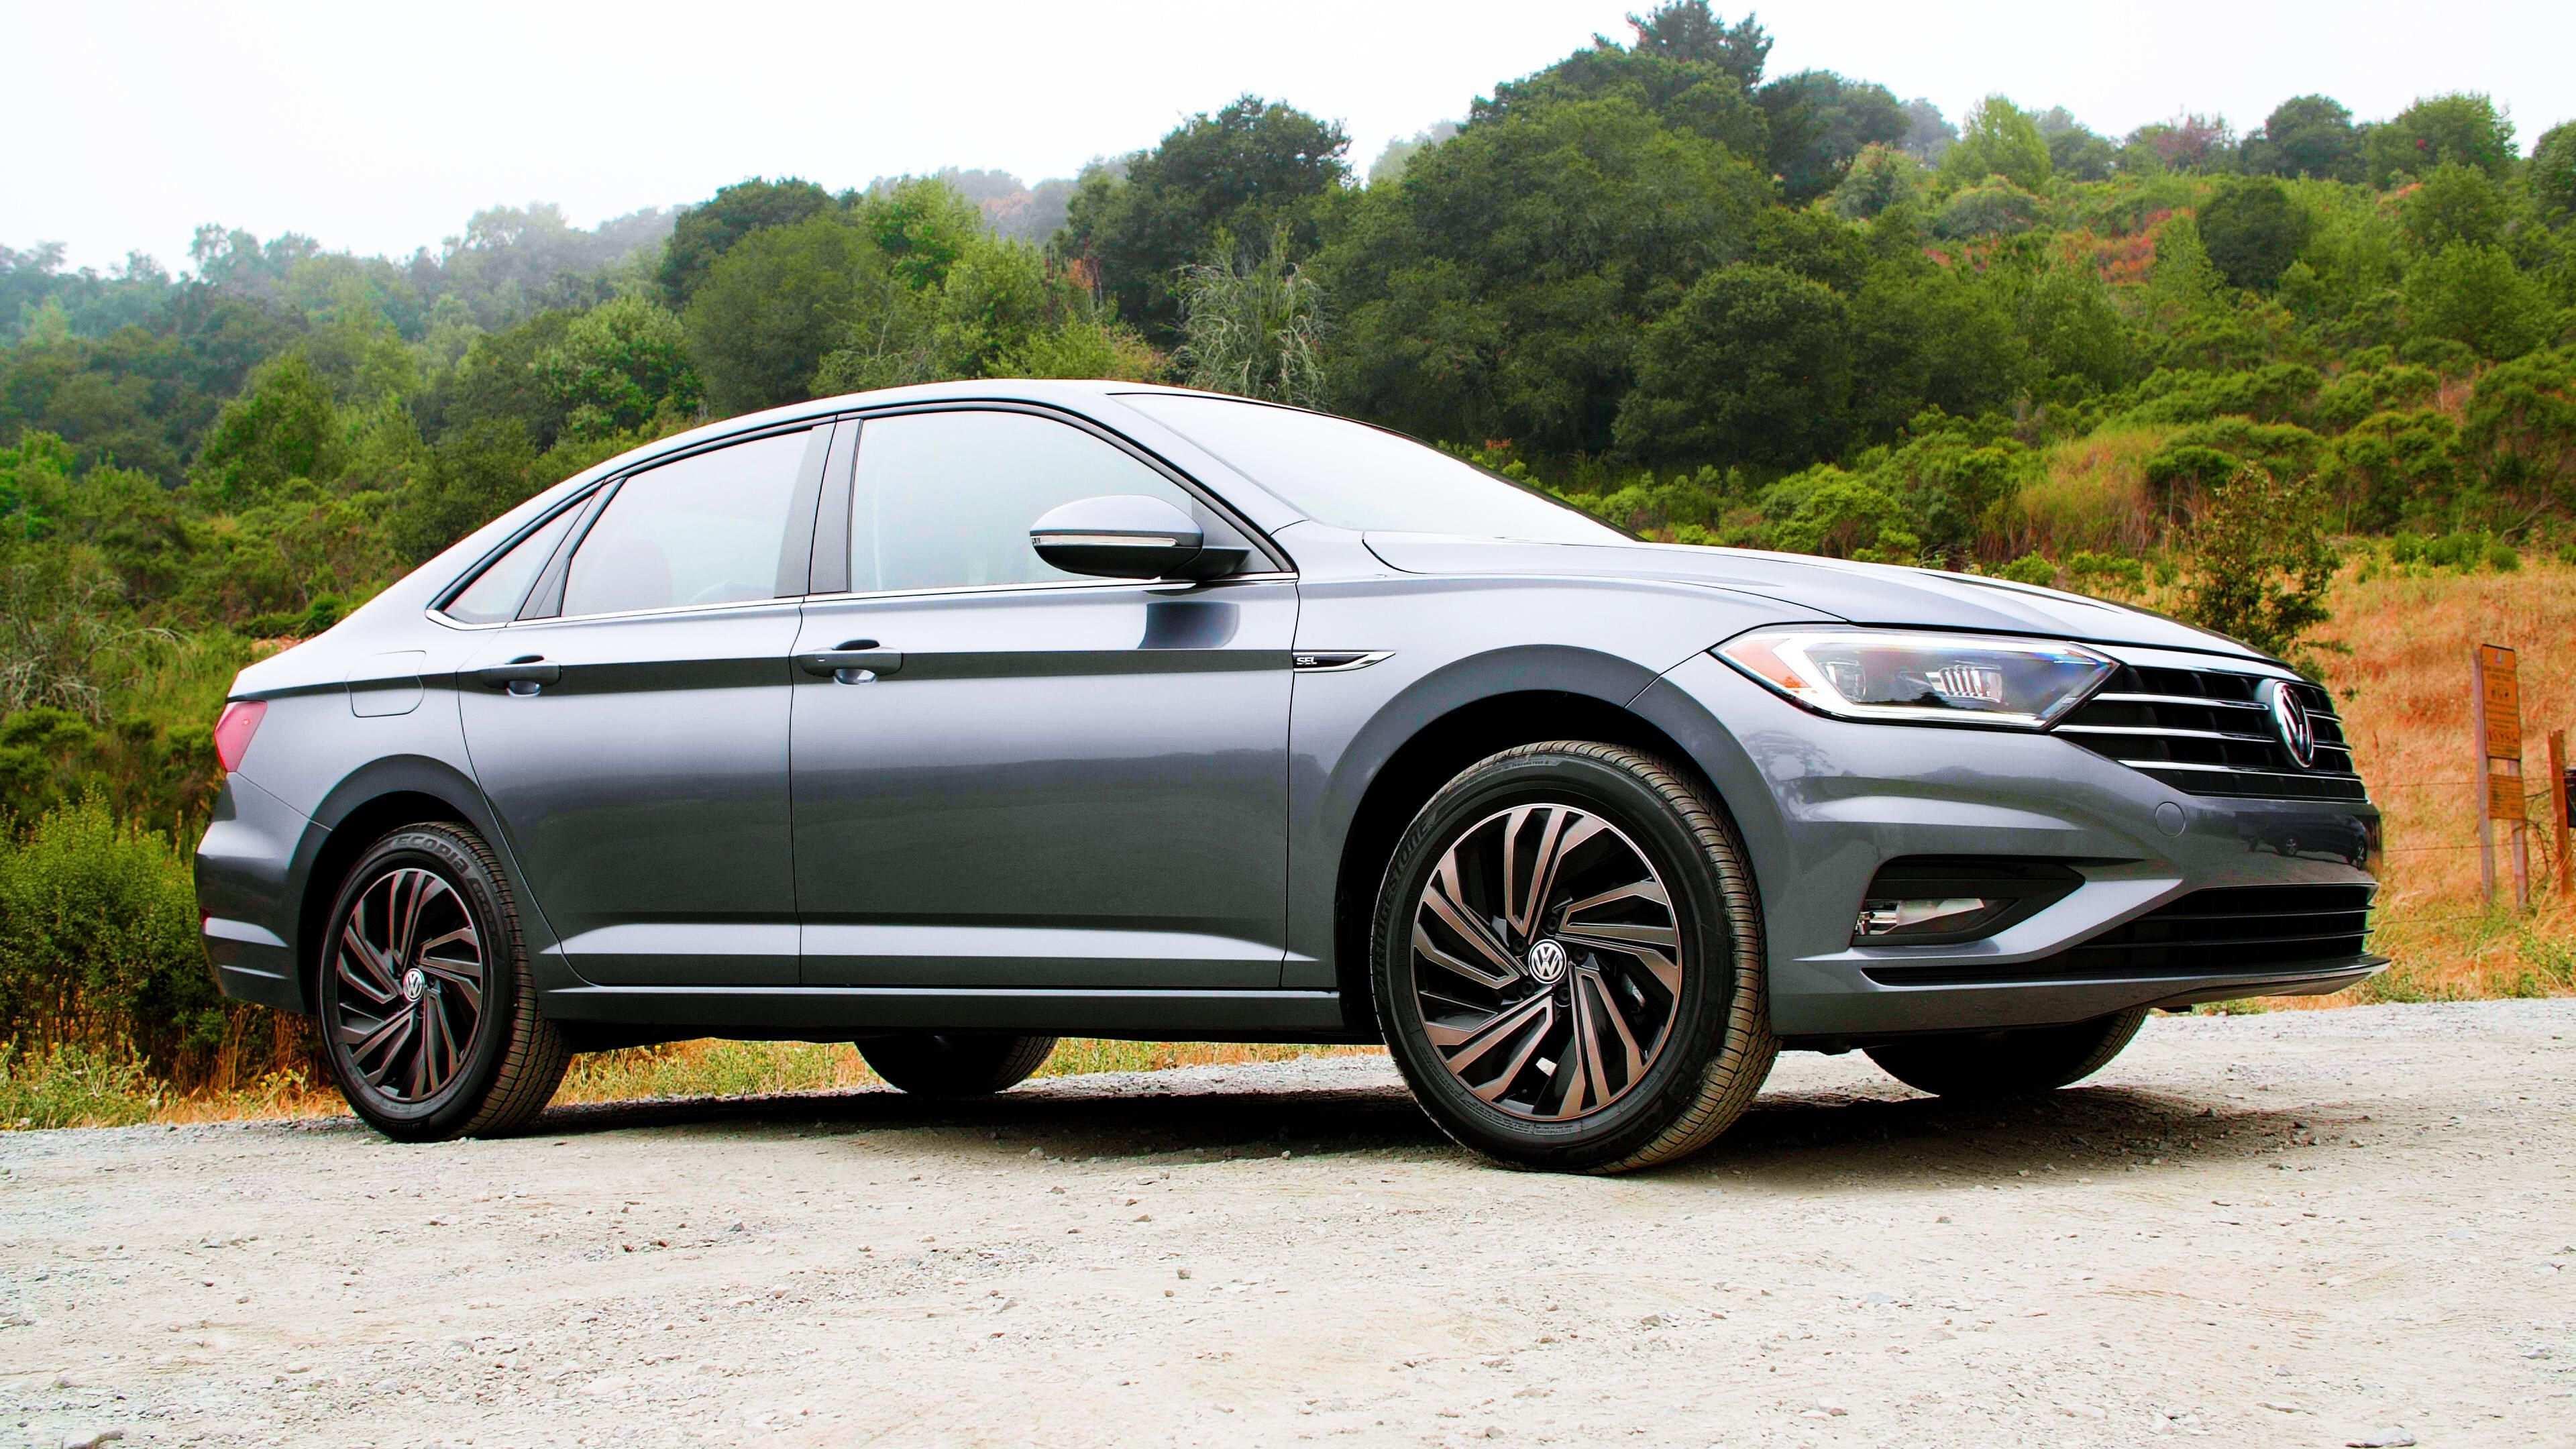 82 New Volkswagen Jetta 2020 New Concept Exterior by Volkswagen Jetta 2020 New Concept